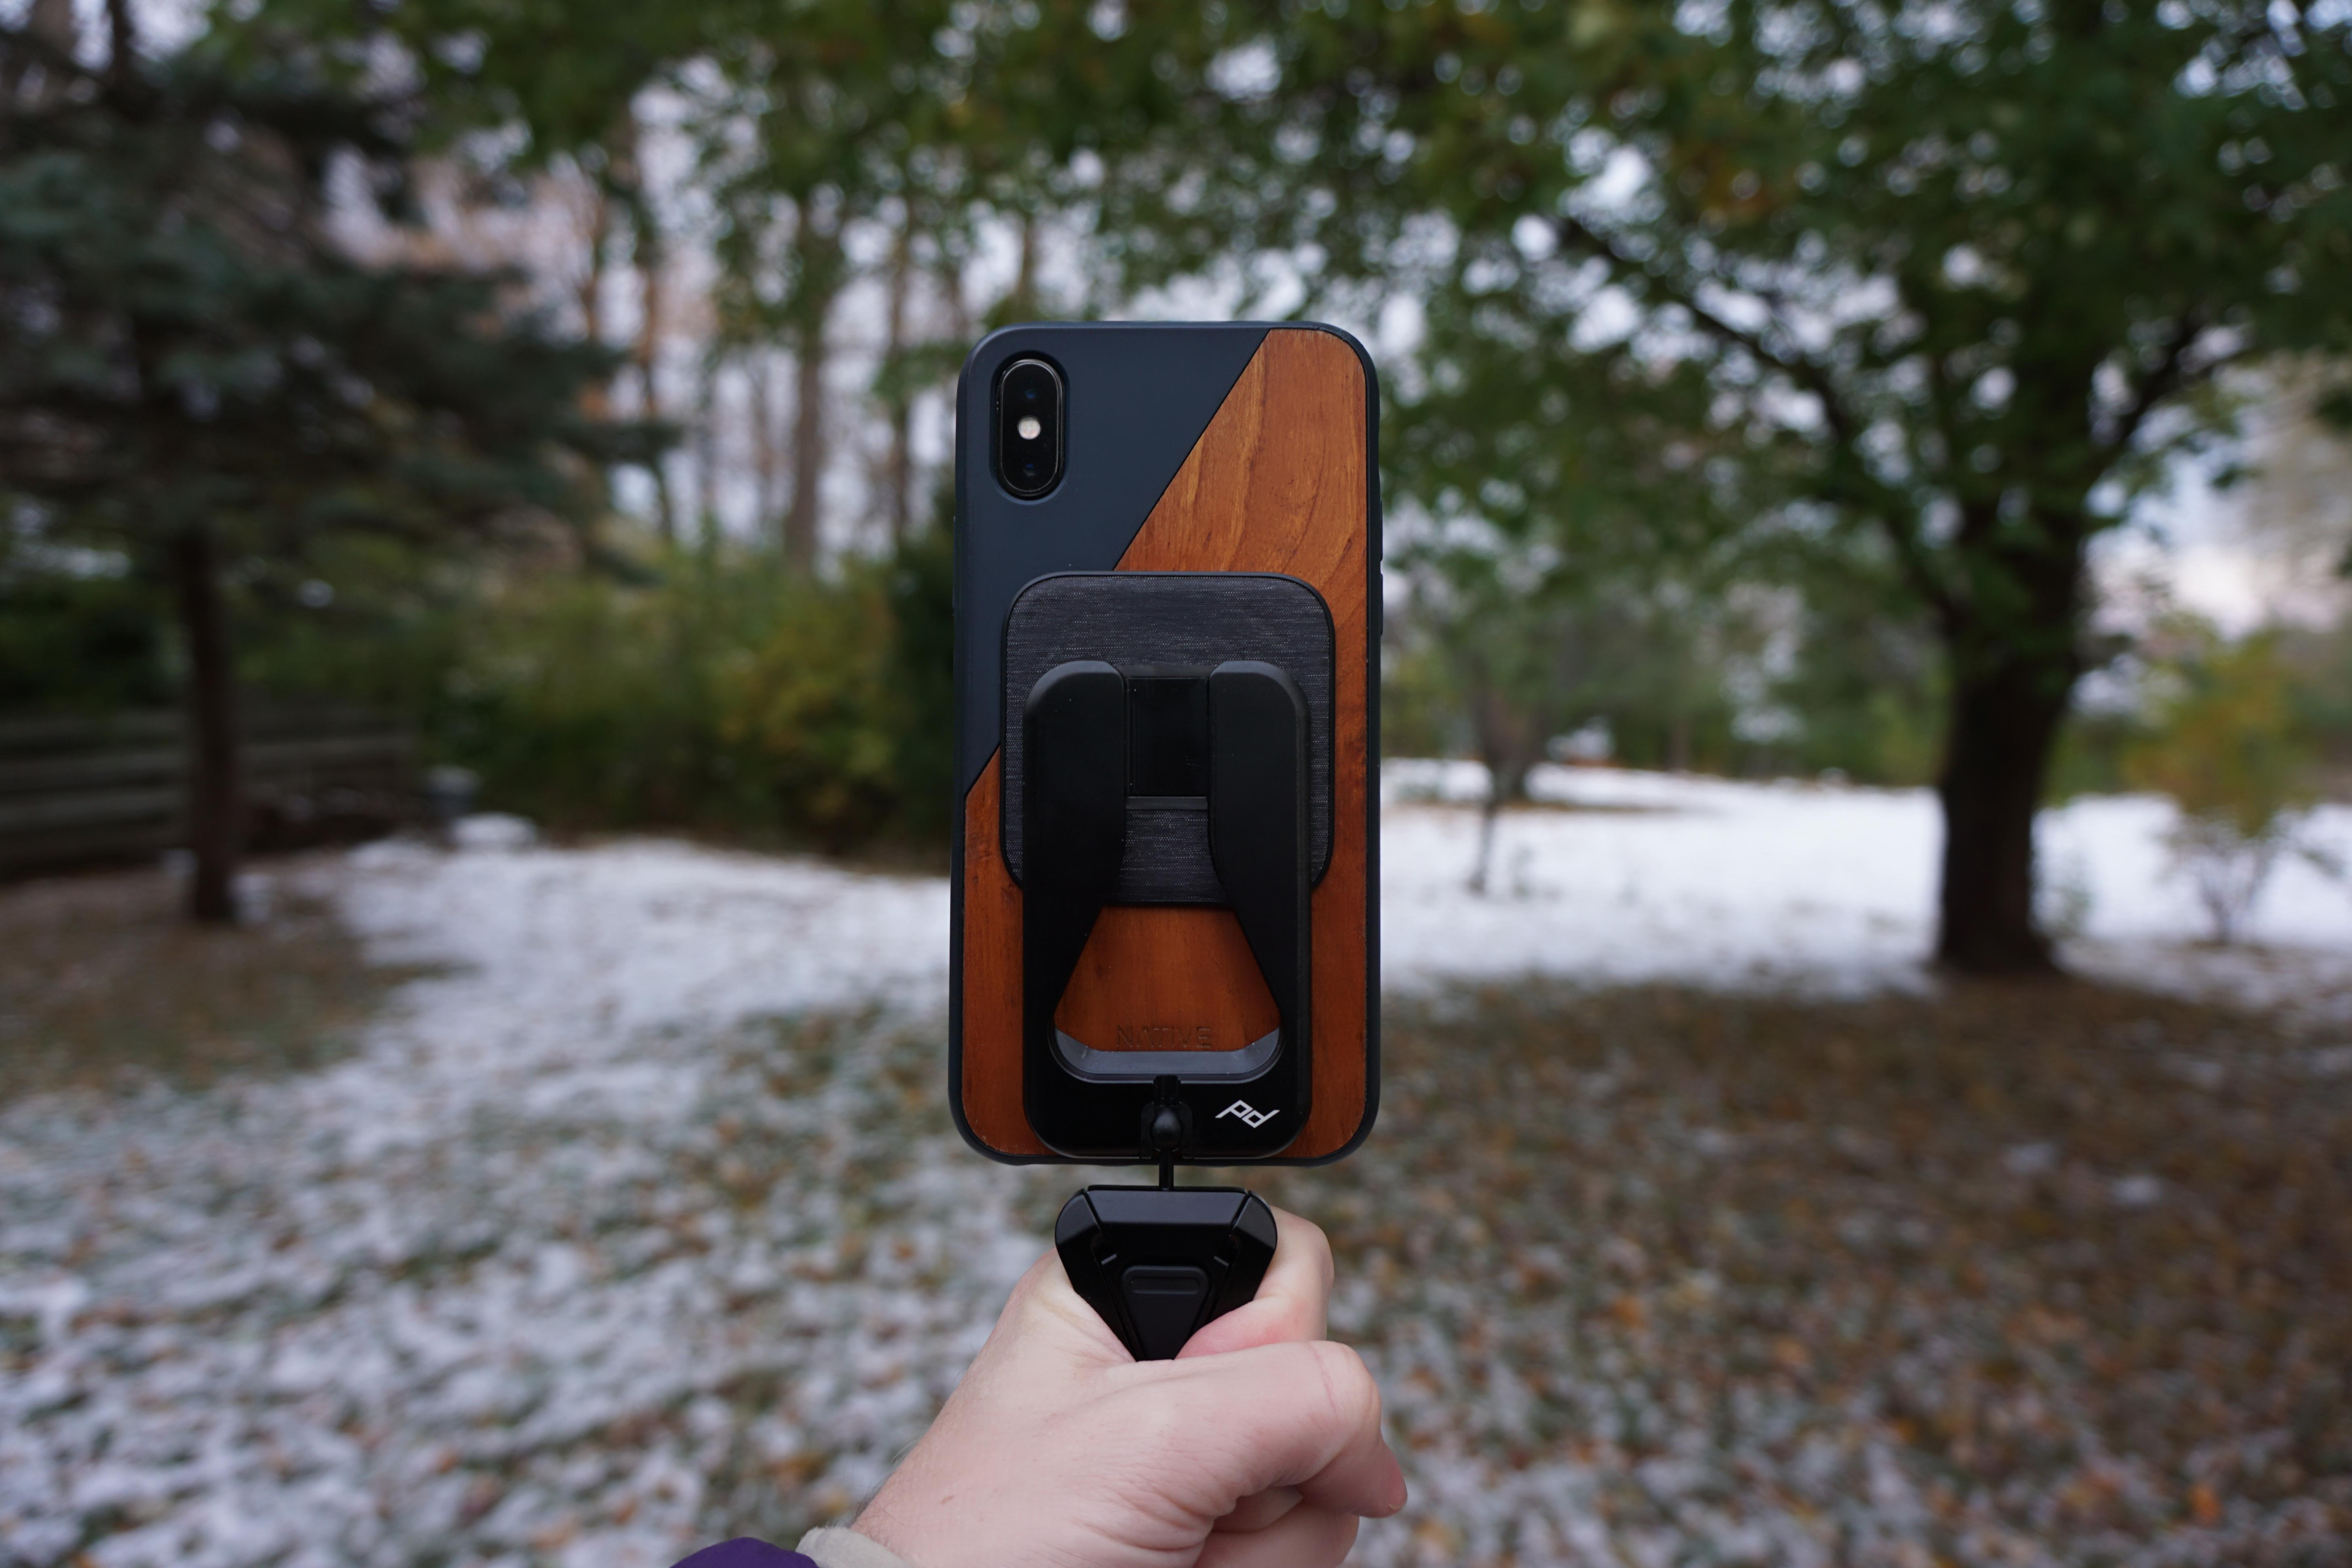 Peak Design Mobile Universal Adapter with Tripod